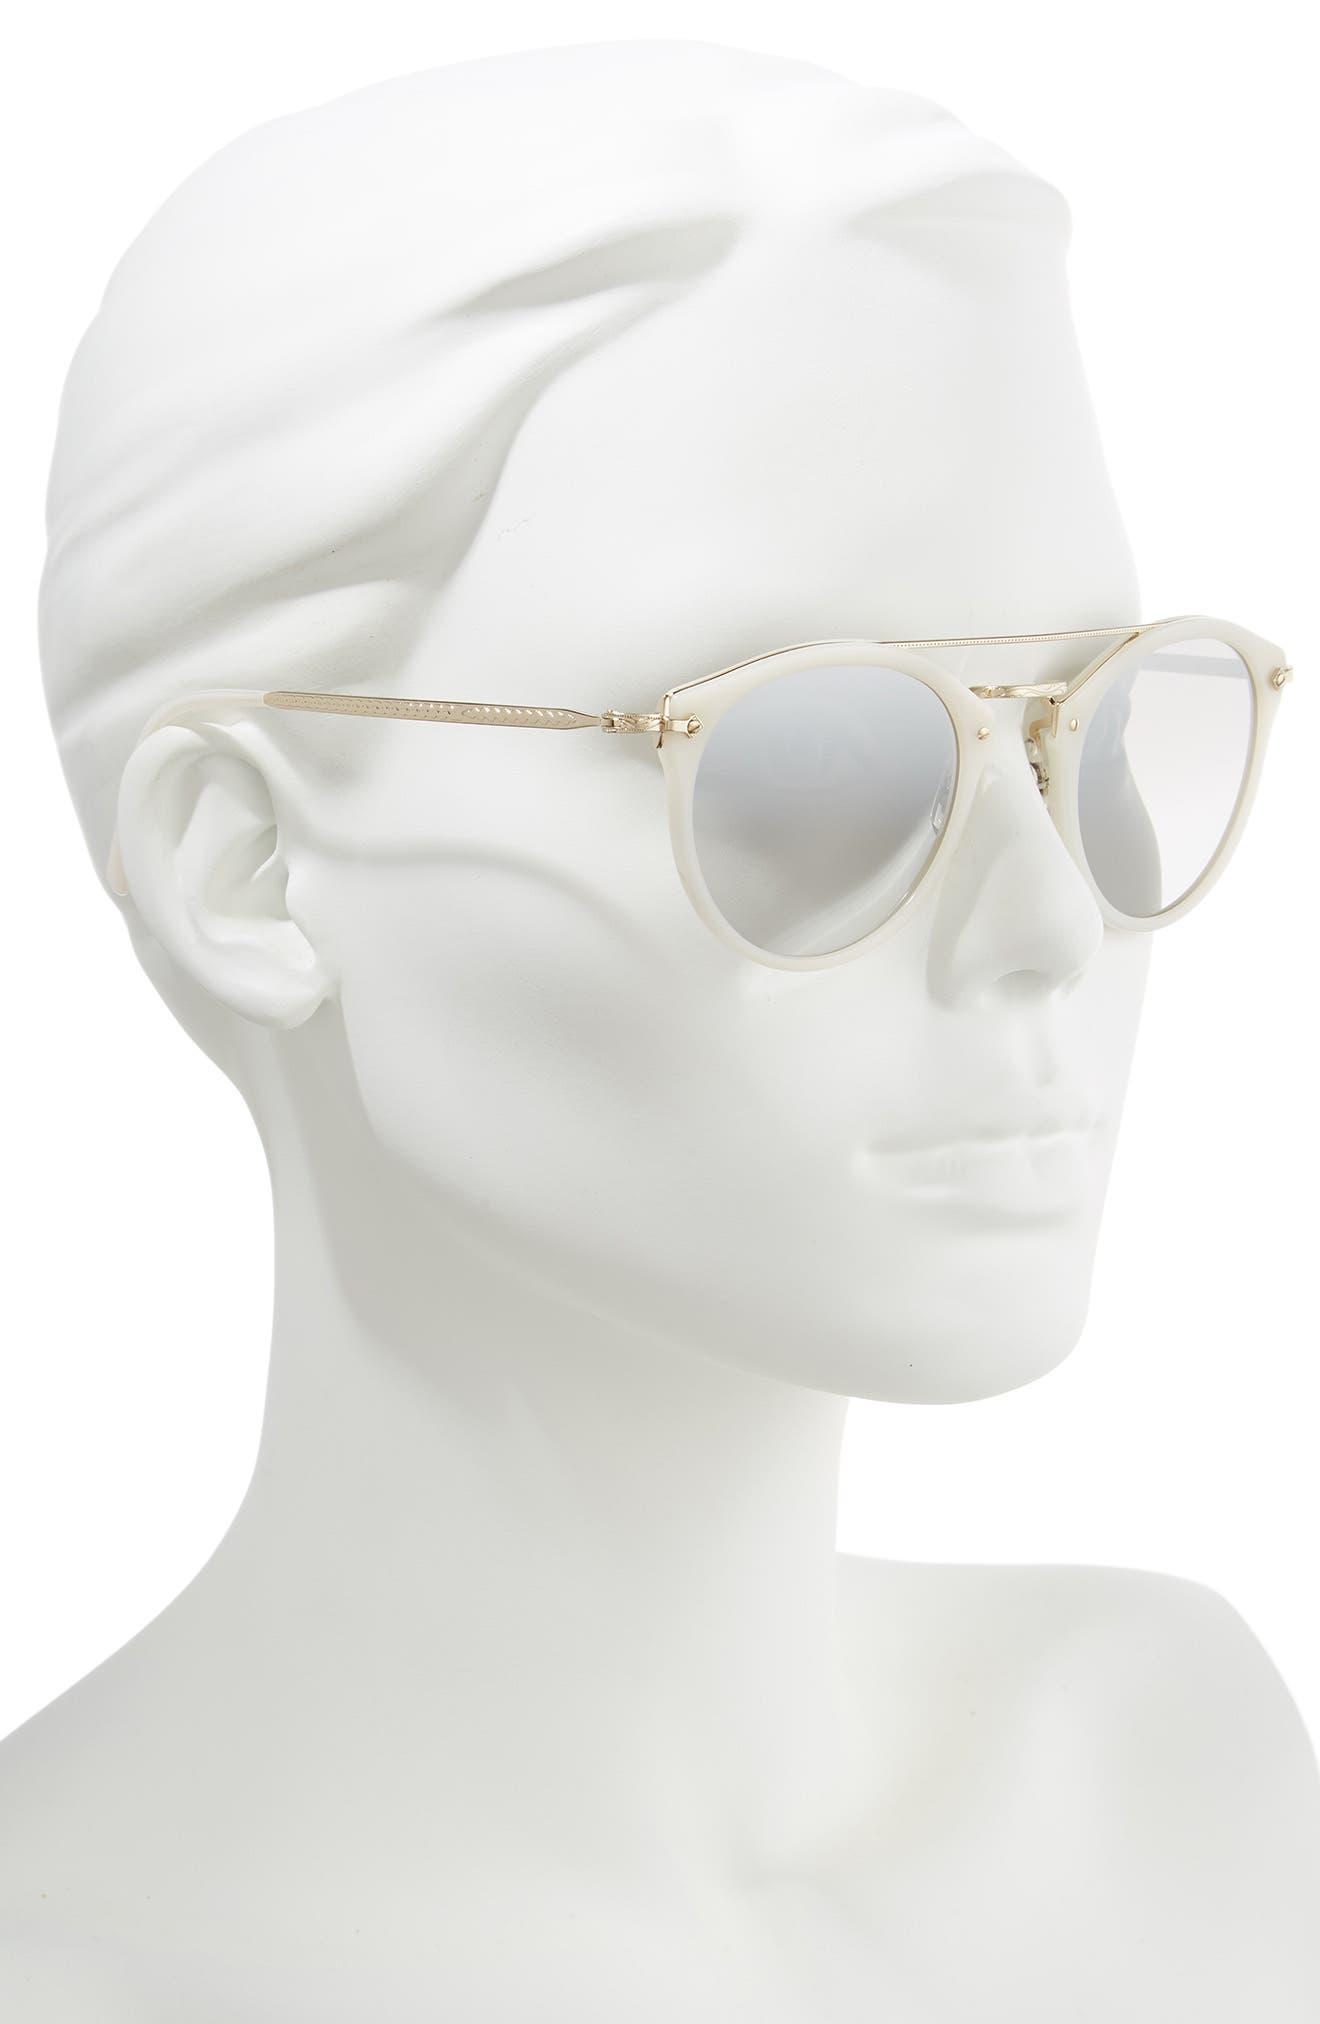 Remick 50mm Brow Bar Sunglasses,                             Alternate thumbnail 2, color,                             100